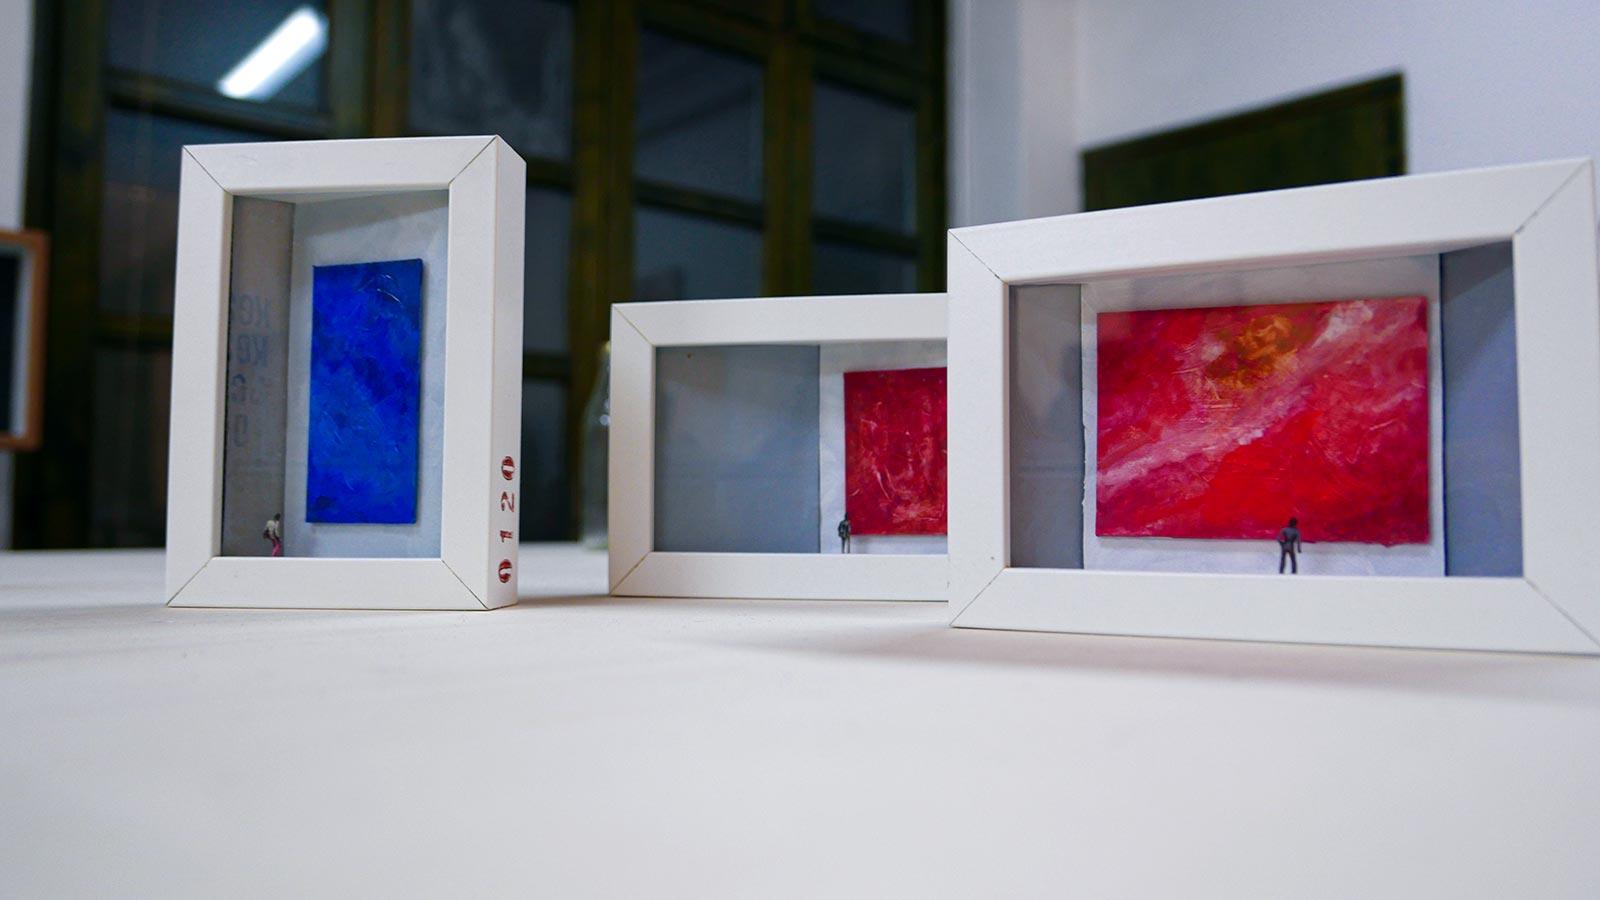 Joyside Stefania Bressani Biennale Venezia arte abbandono